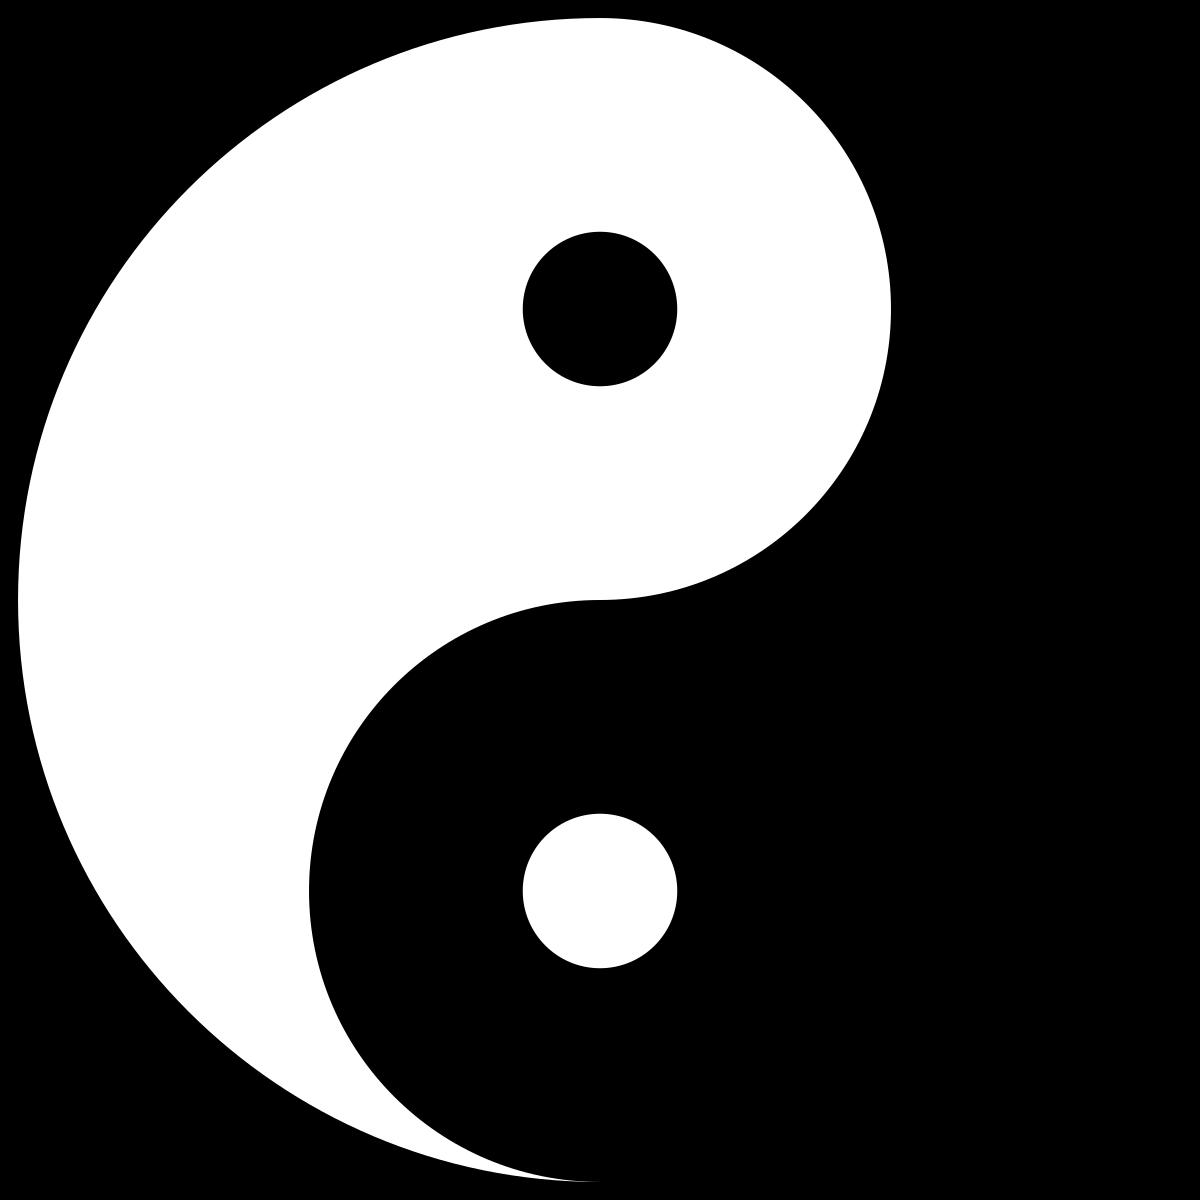 yin yang capital social contabilidade e gest o. Black Bedroom Furniture Sets. Home Design Ideas